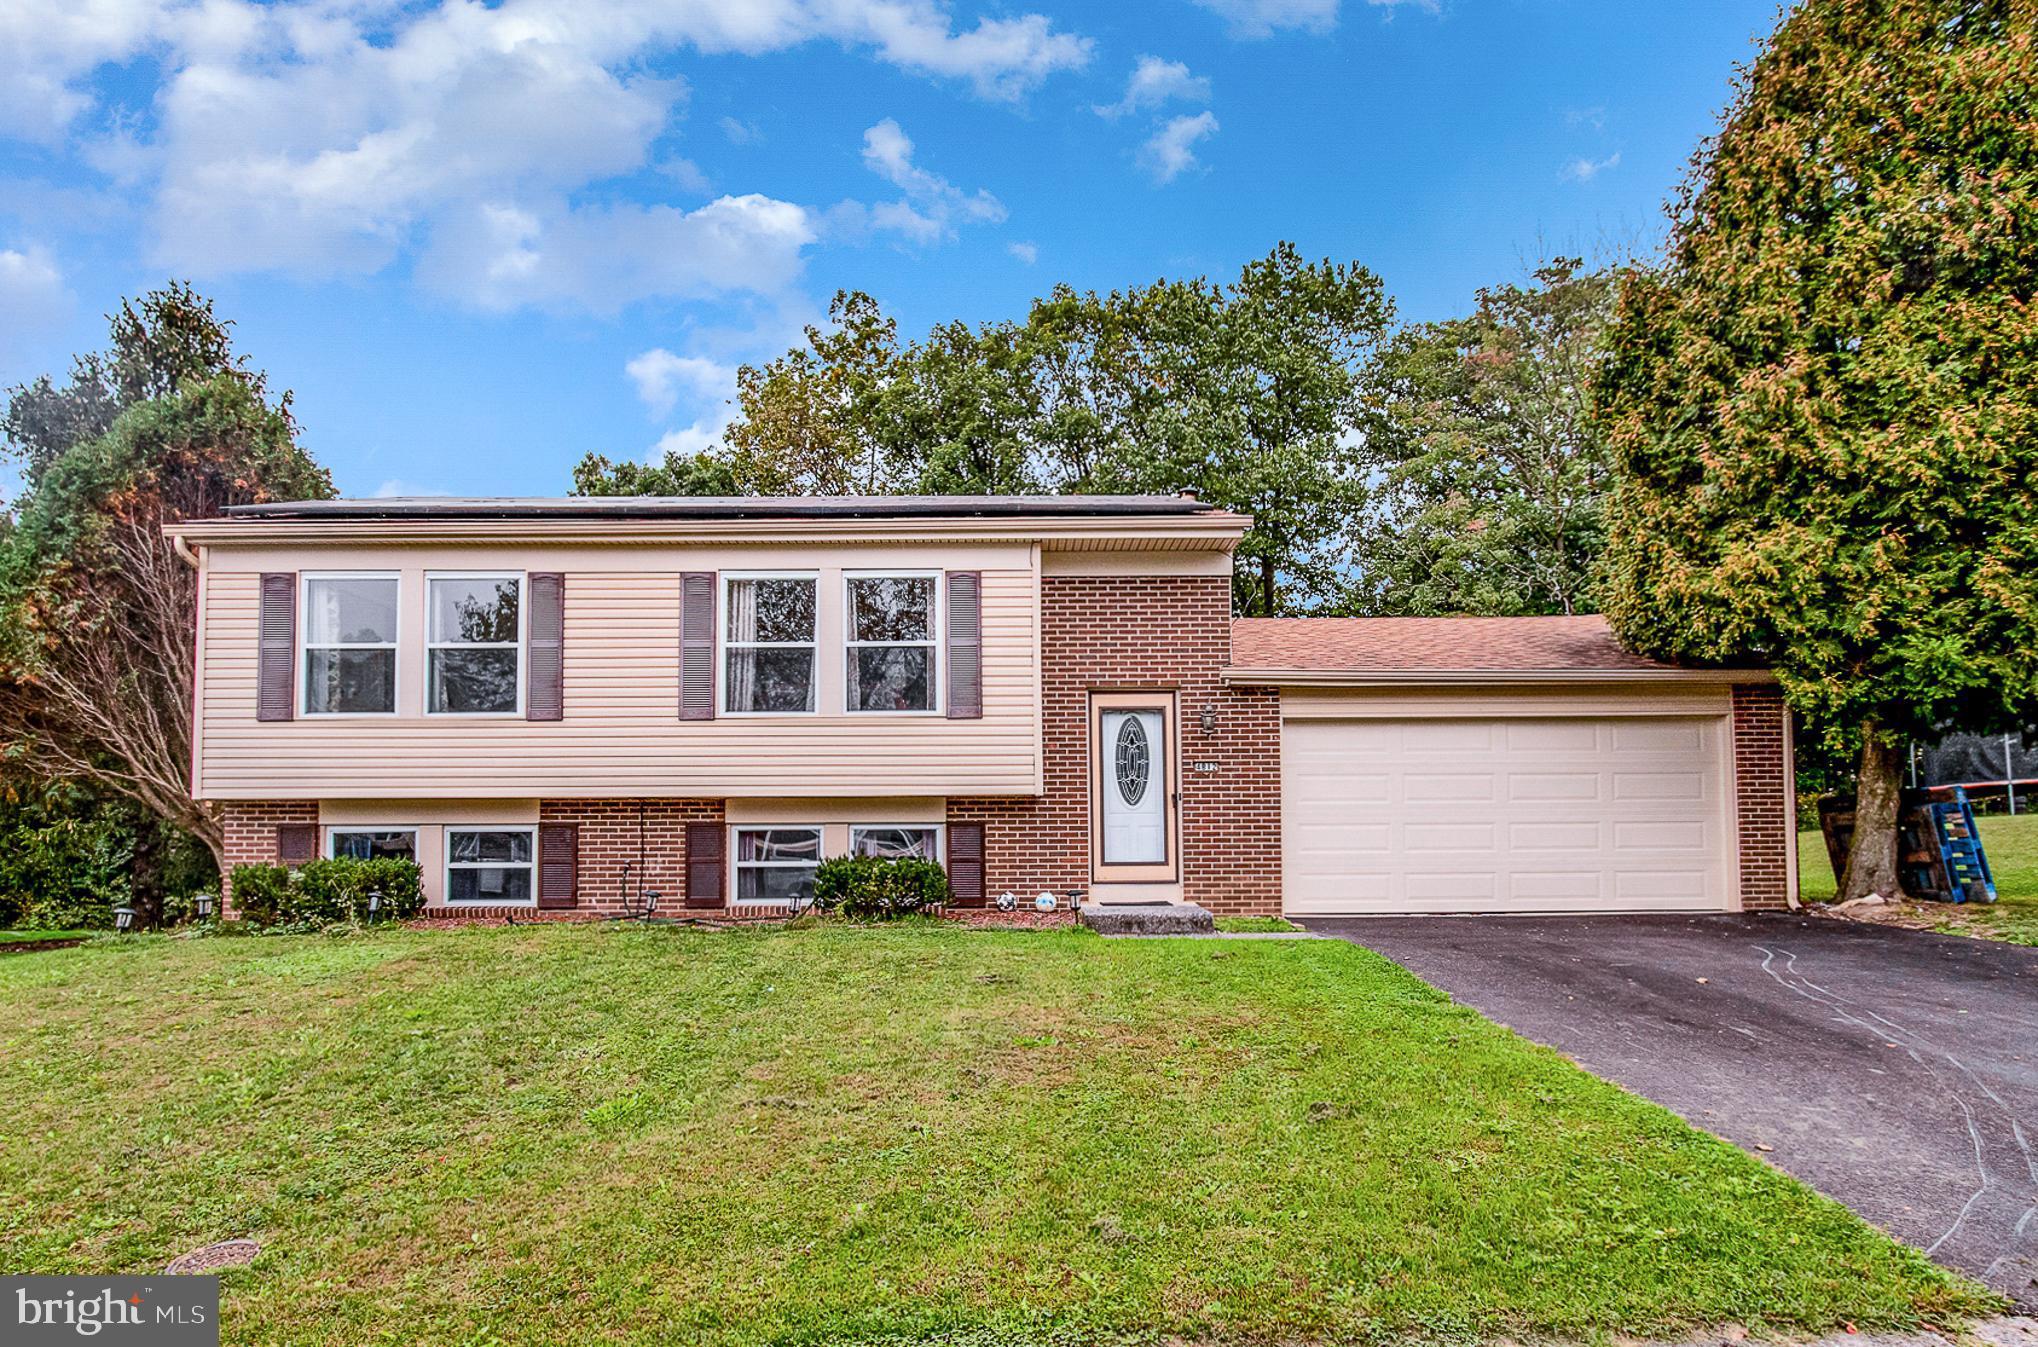 4812 Sweetbrier Drive, Harrisburg, PA 17111